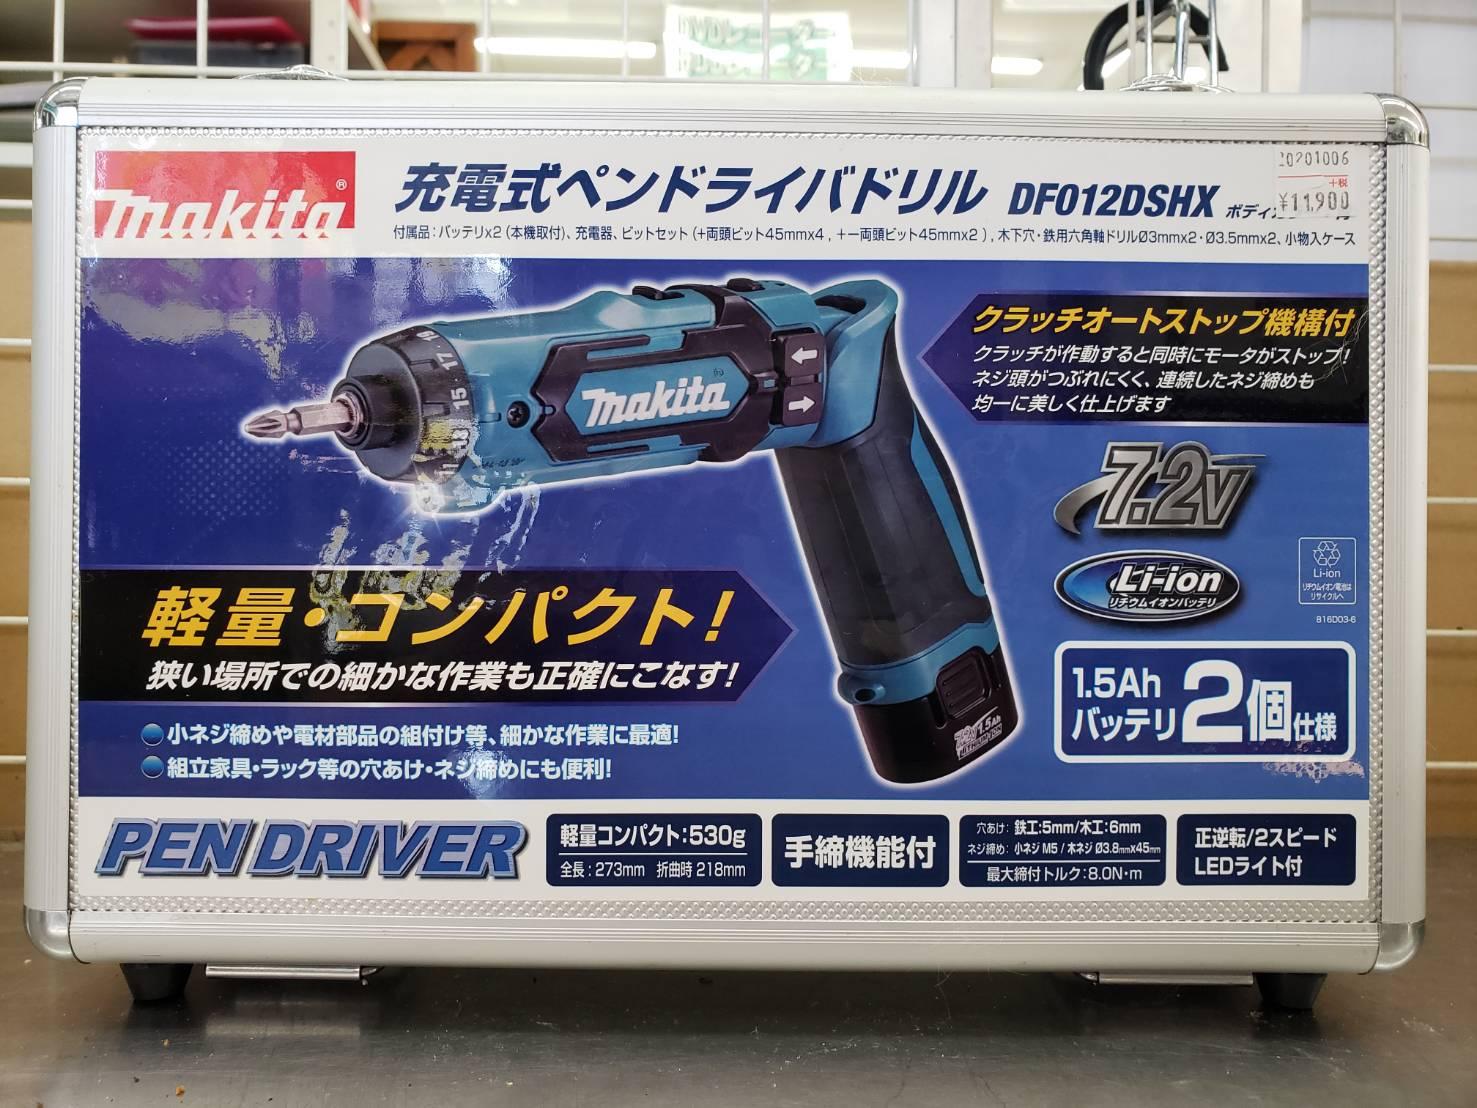 makita / マキタ 充電式ペンドライバドリル DF012DSHX 未使用品 買取致しましたの買取-